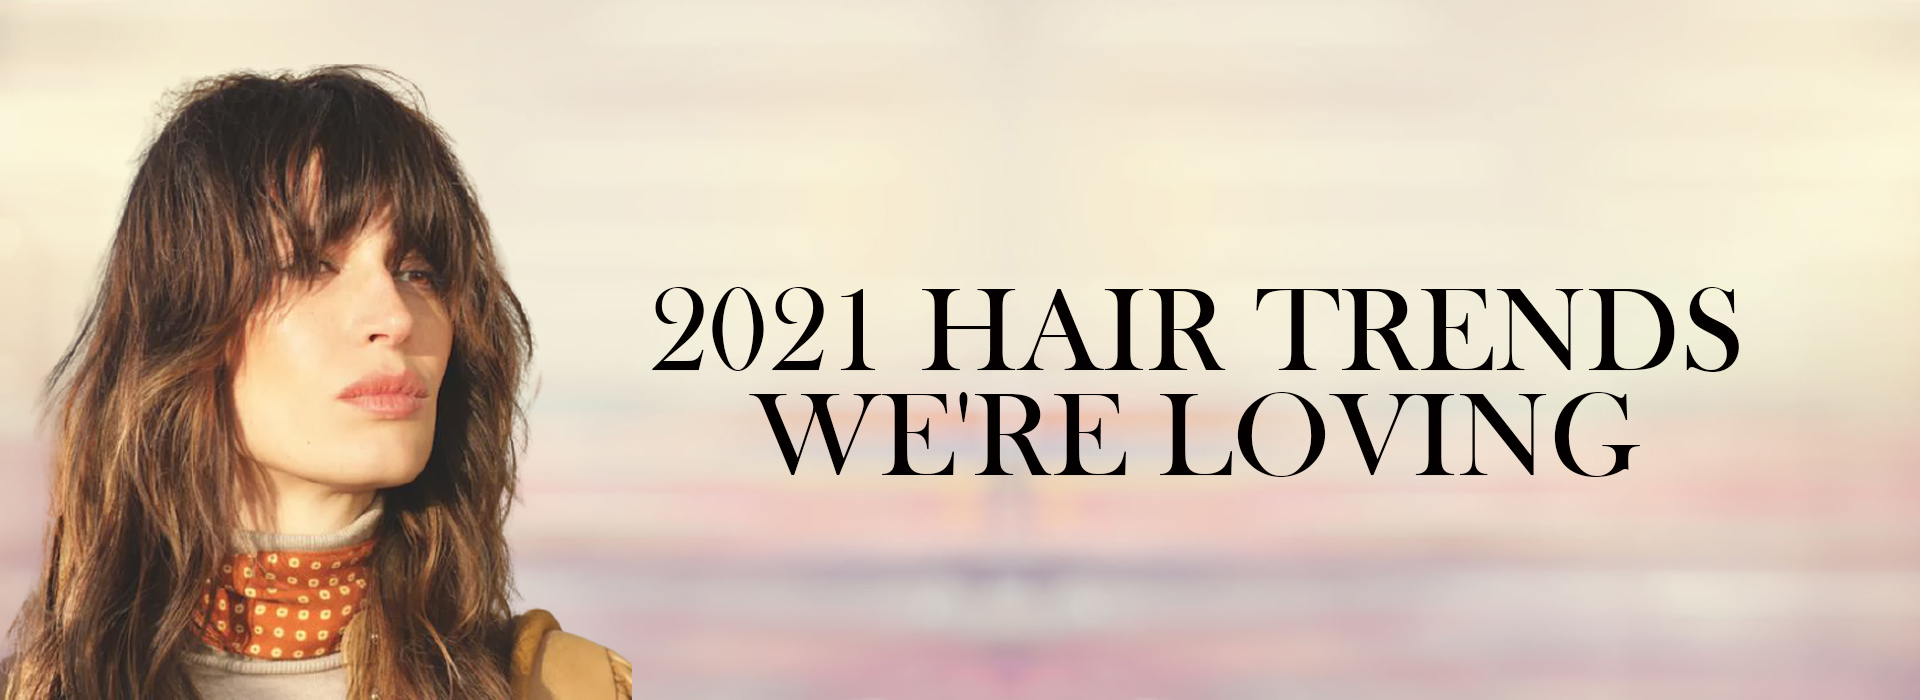 2021 Hair Trends Were Loving Lore Hairdressing Salon in North Baddlesley